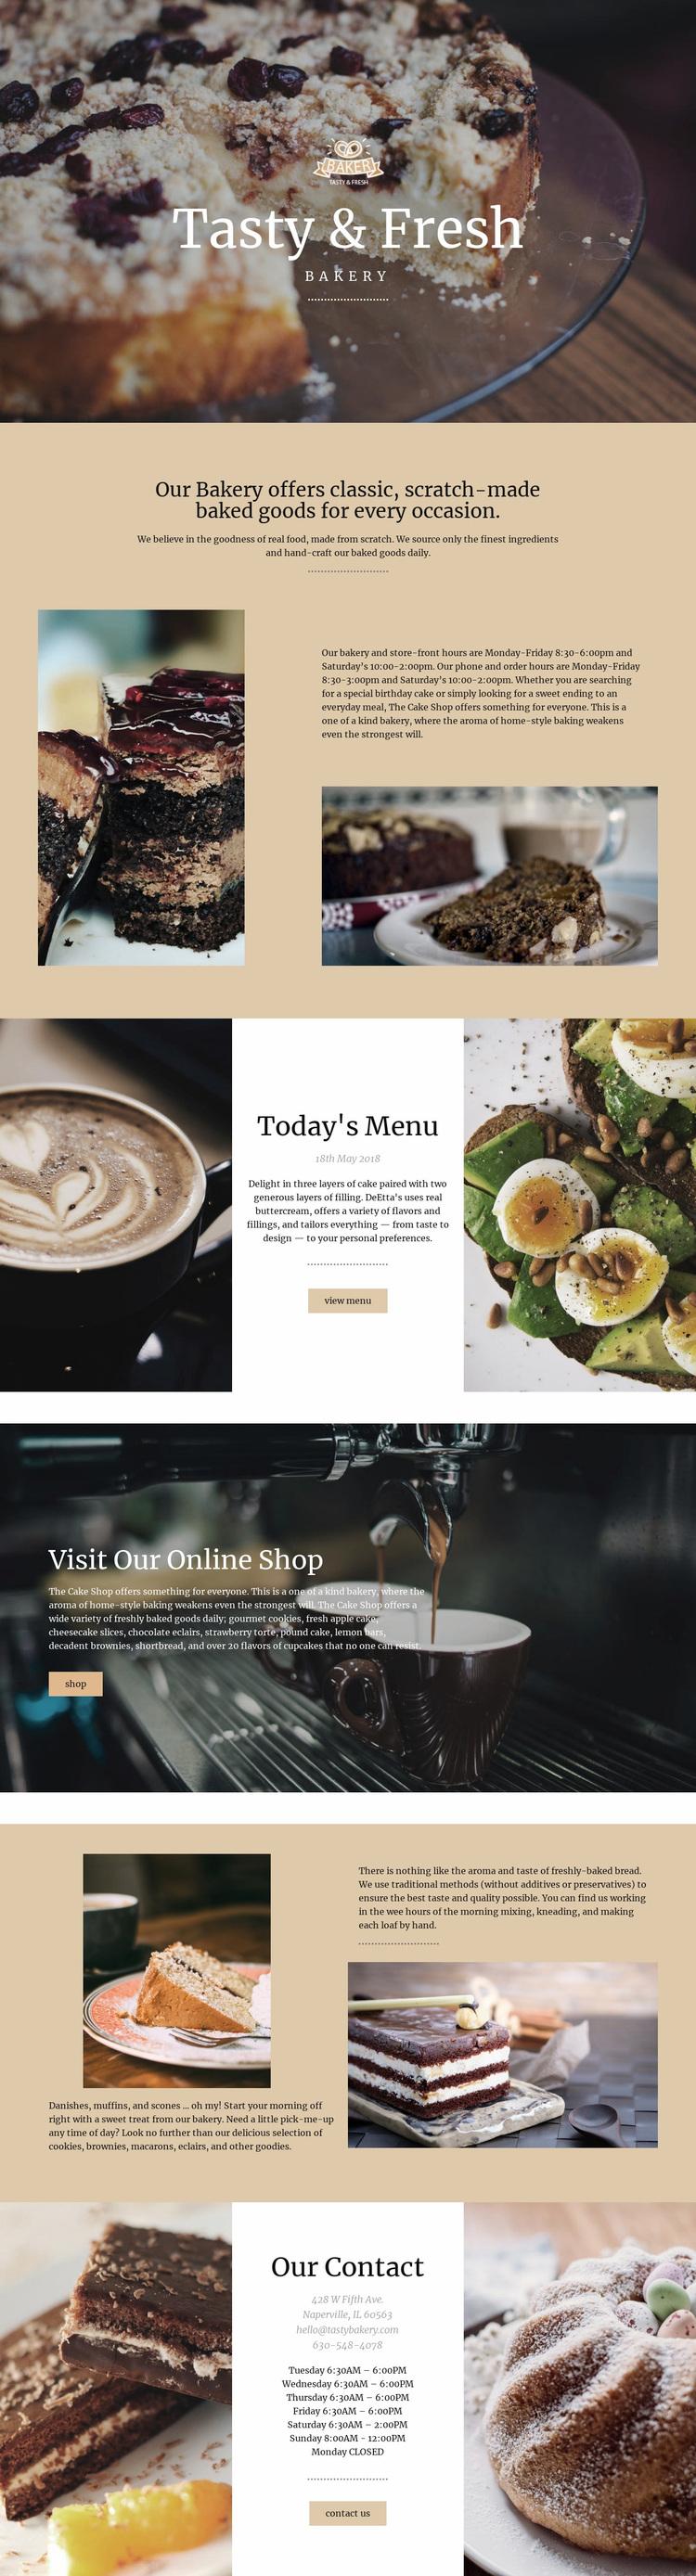 Tasty and fresh food Web Page Designer